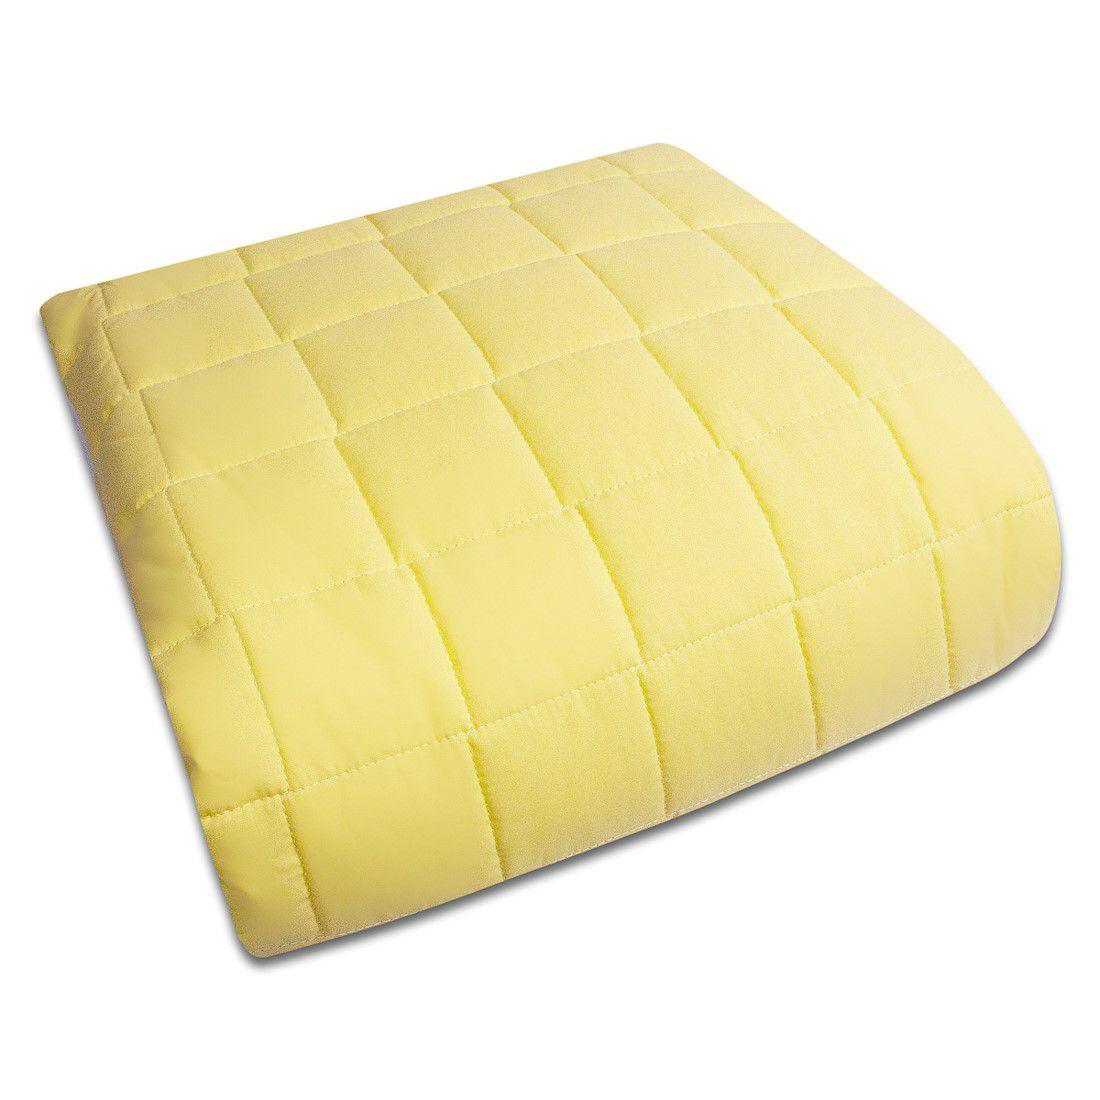 Colcha Mini Cama Com Elástico Percal 200 Fios Cubos amarelo Claro